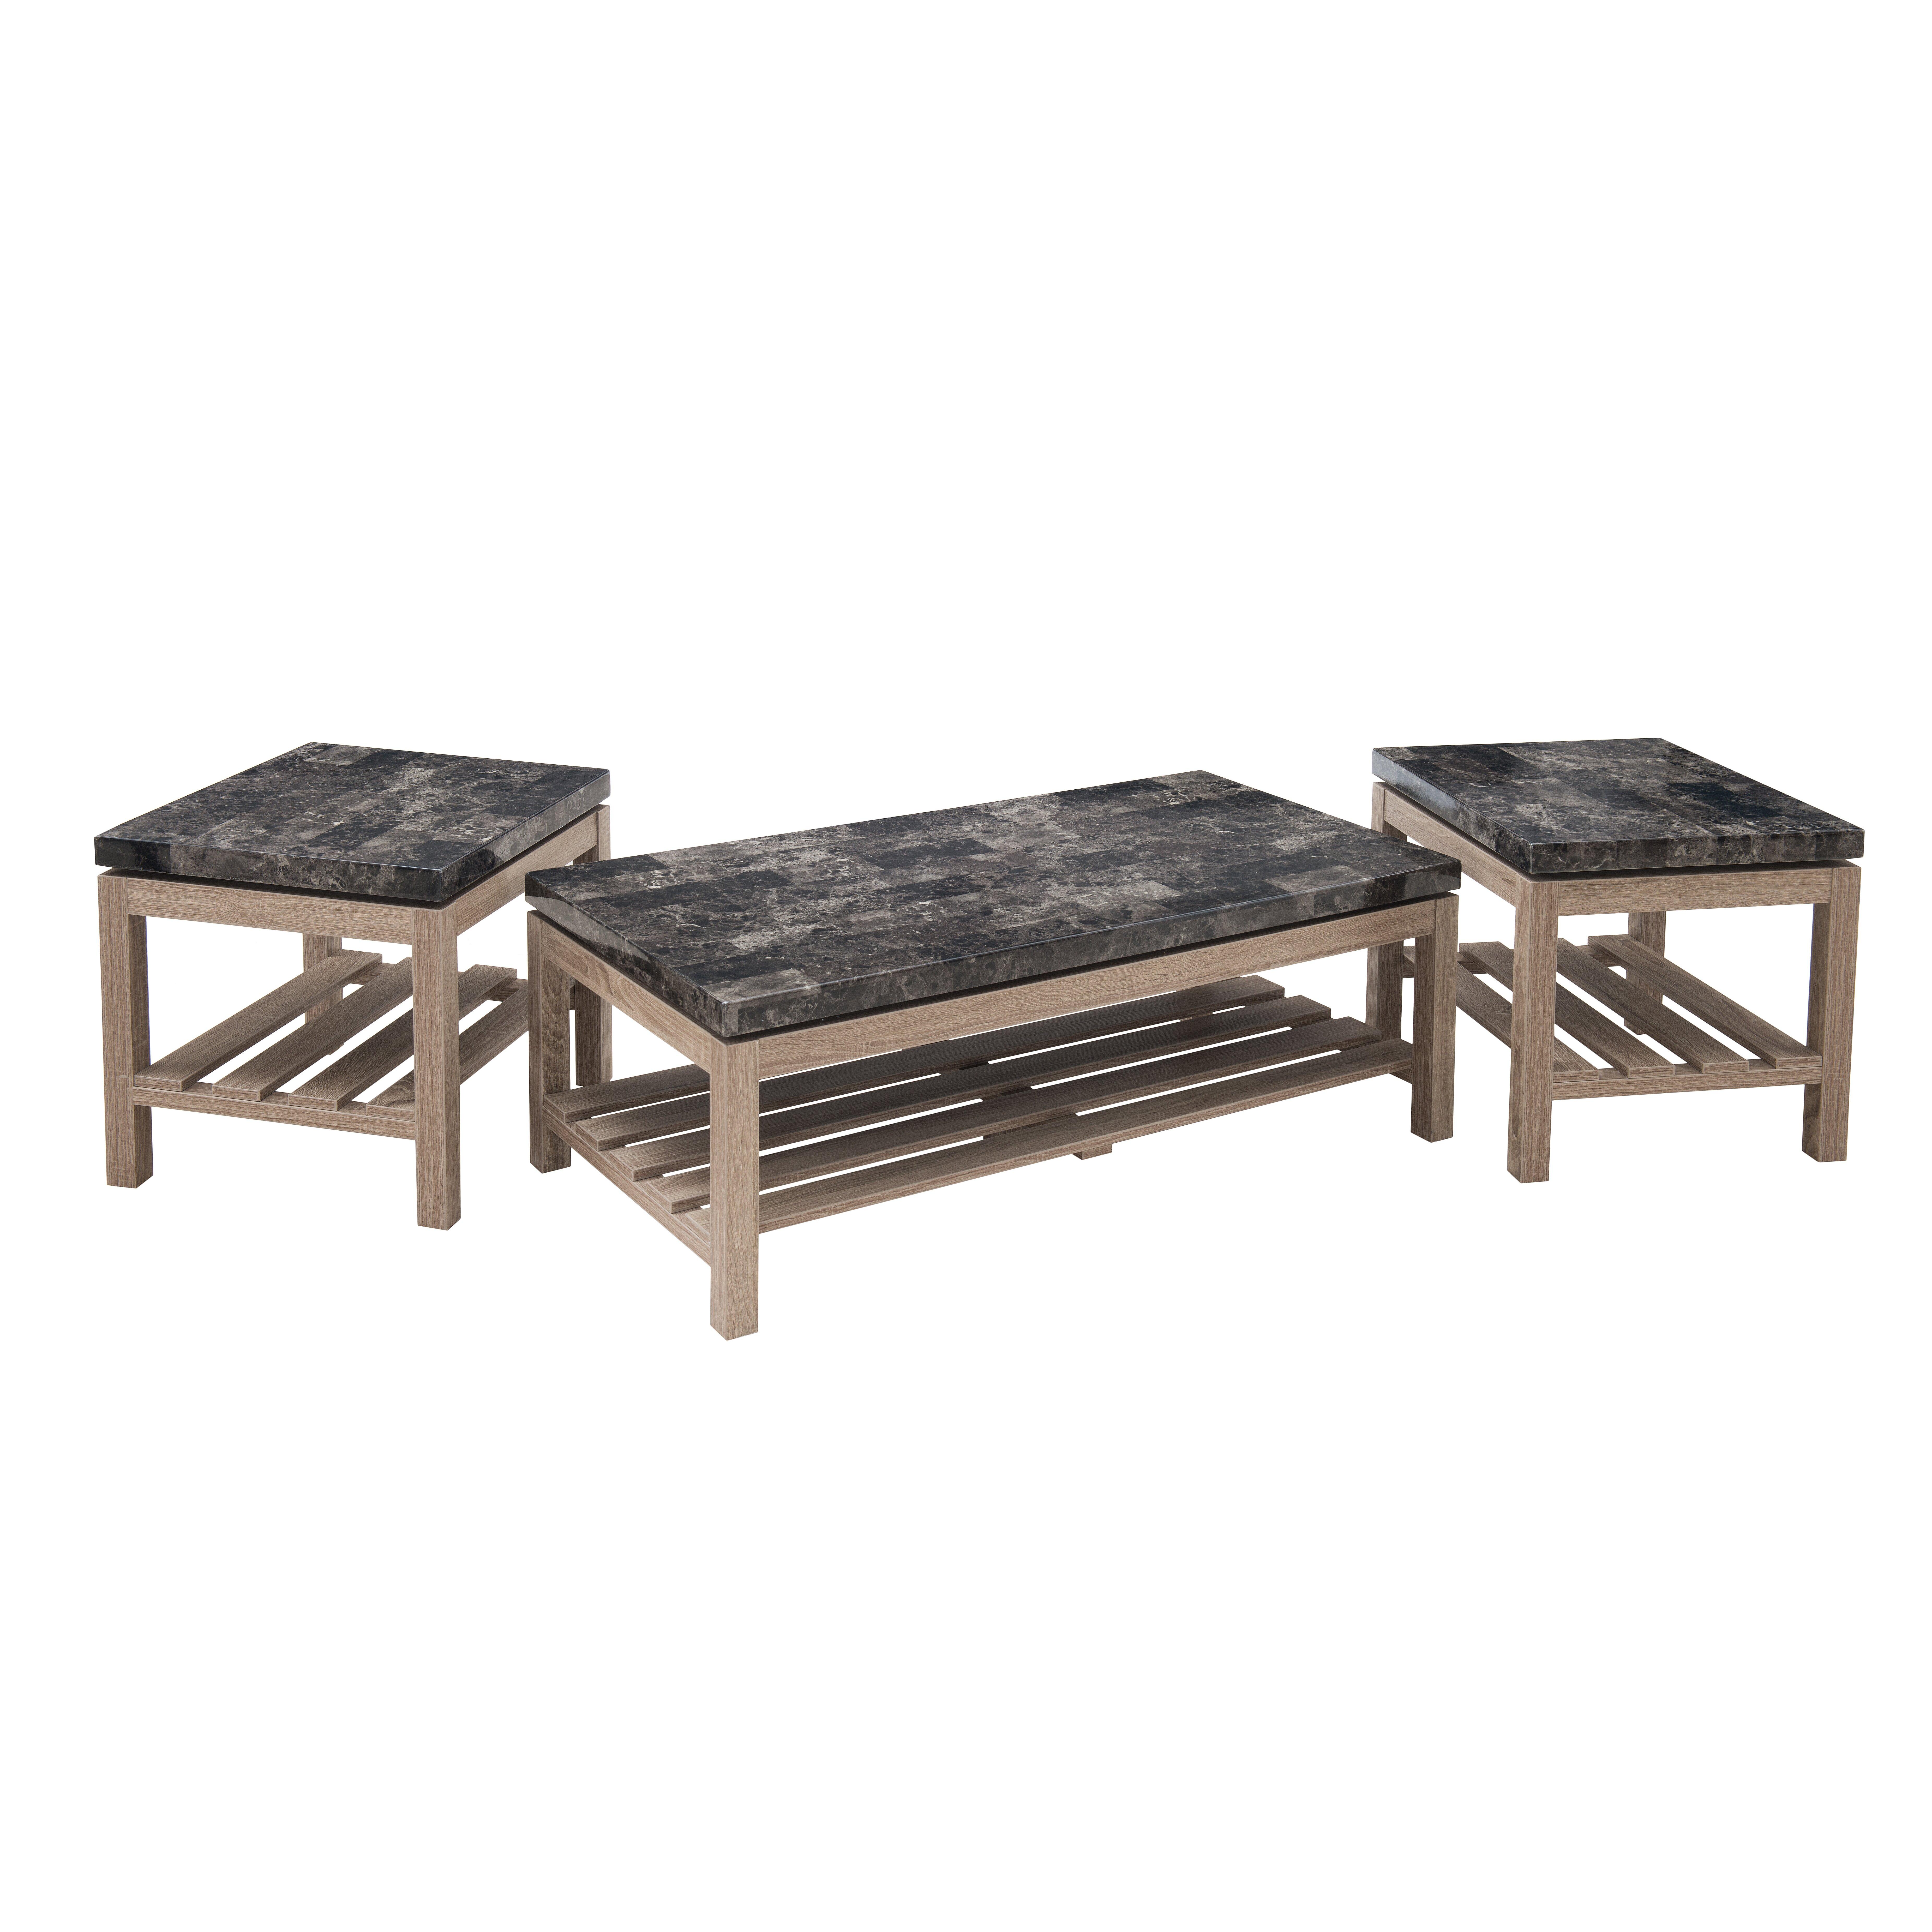 Laurel Foundry Modern Farmhouse Ambroise Coffee Table Set